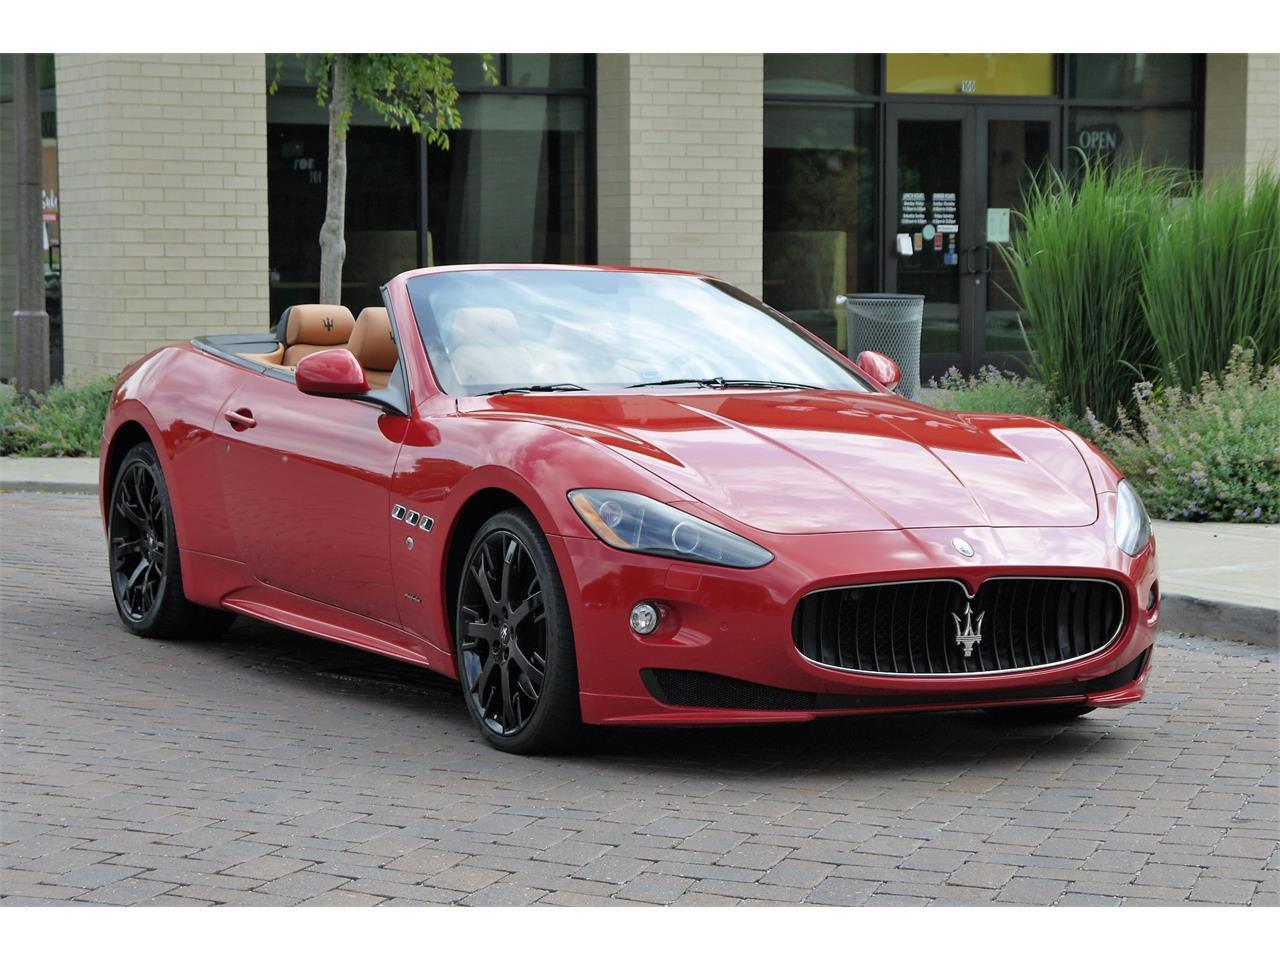 2012 Maserati GranTurismo for Sale | ClassicCars.com | CC ...